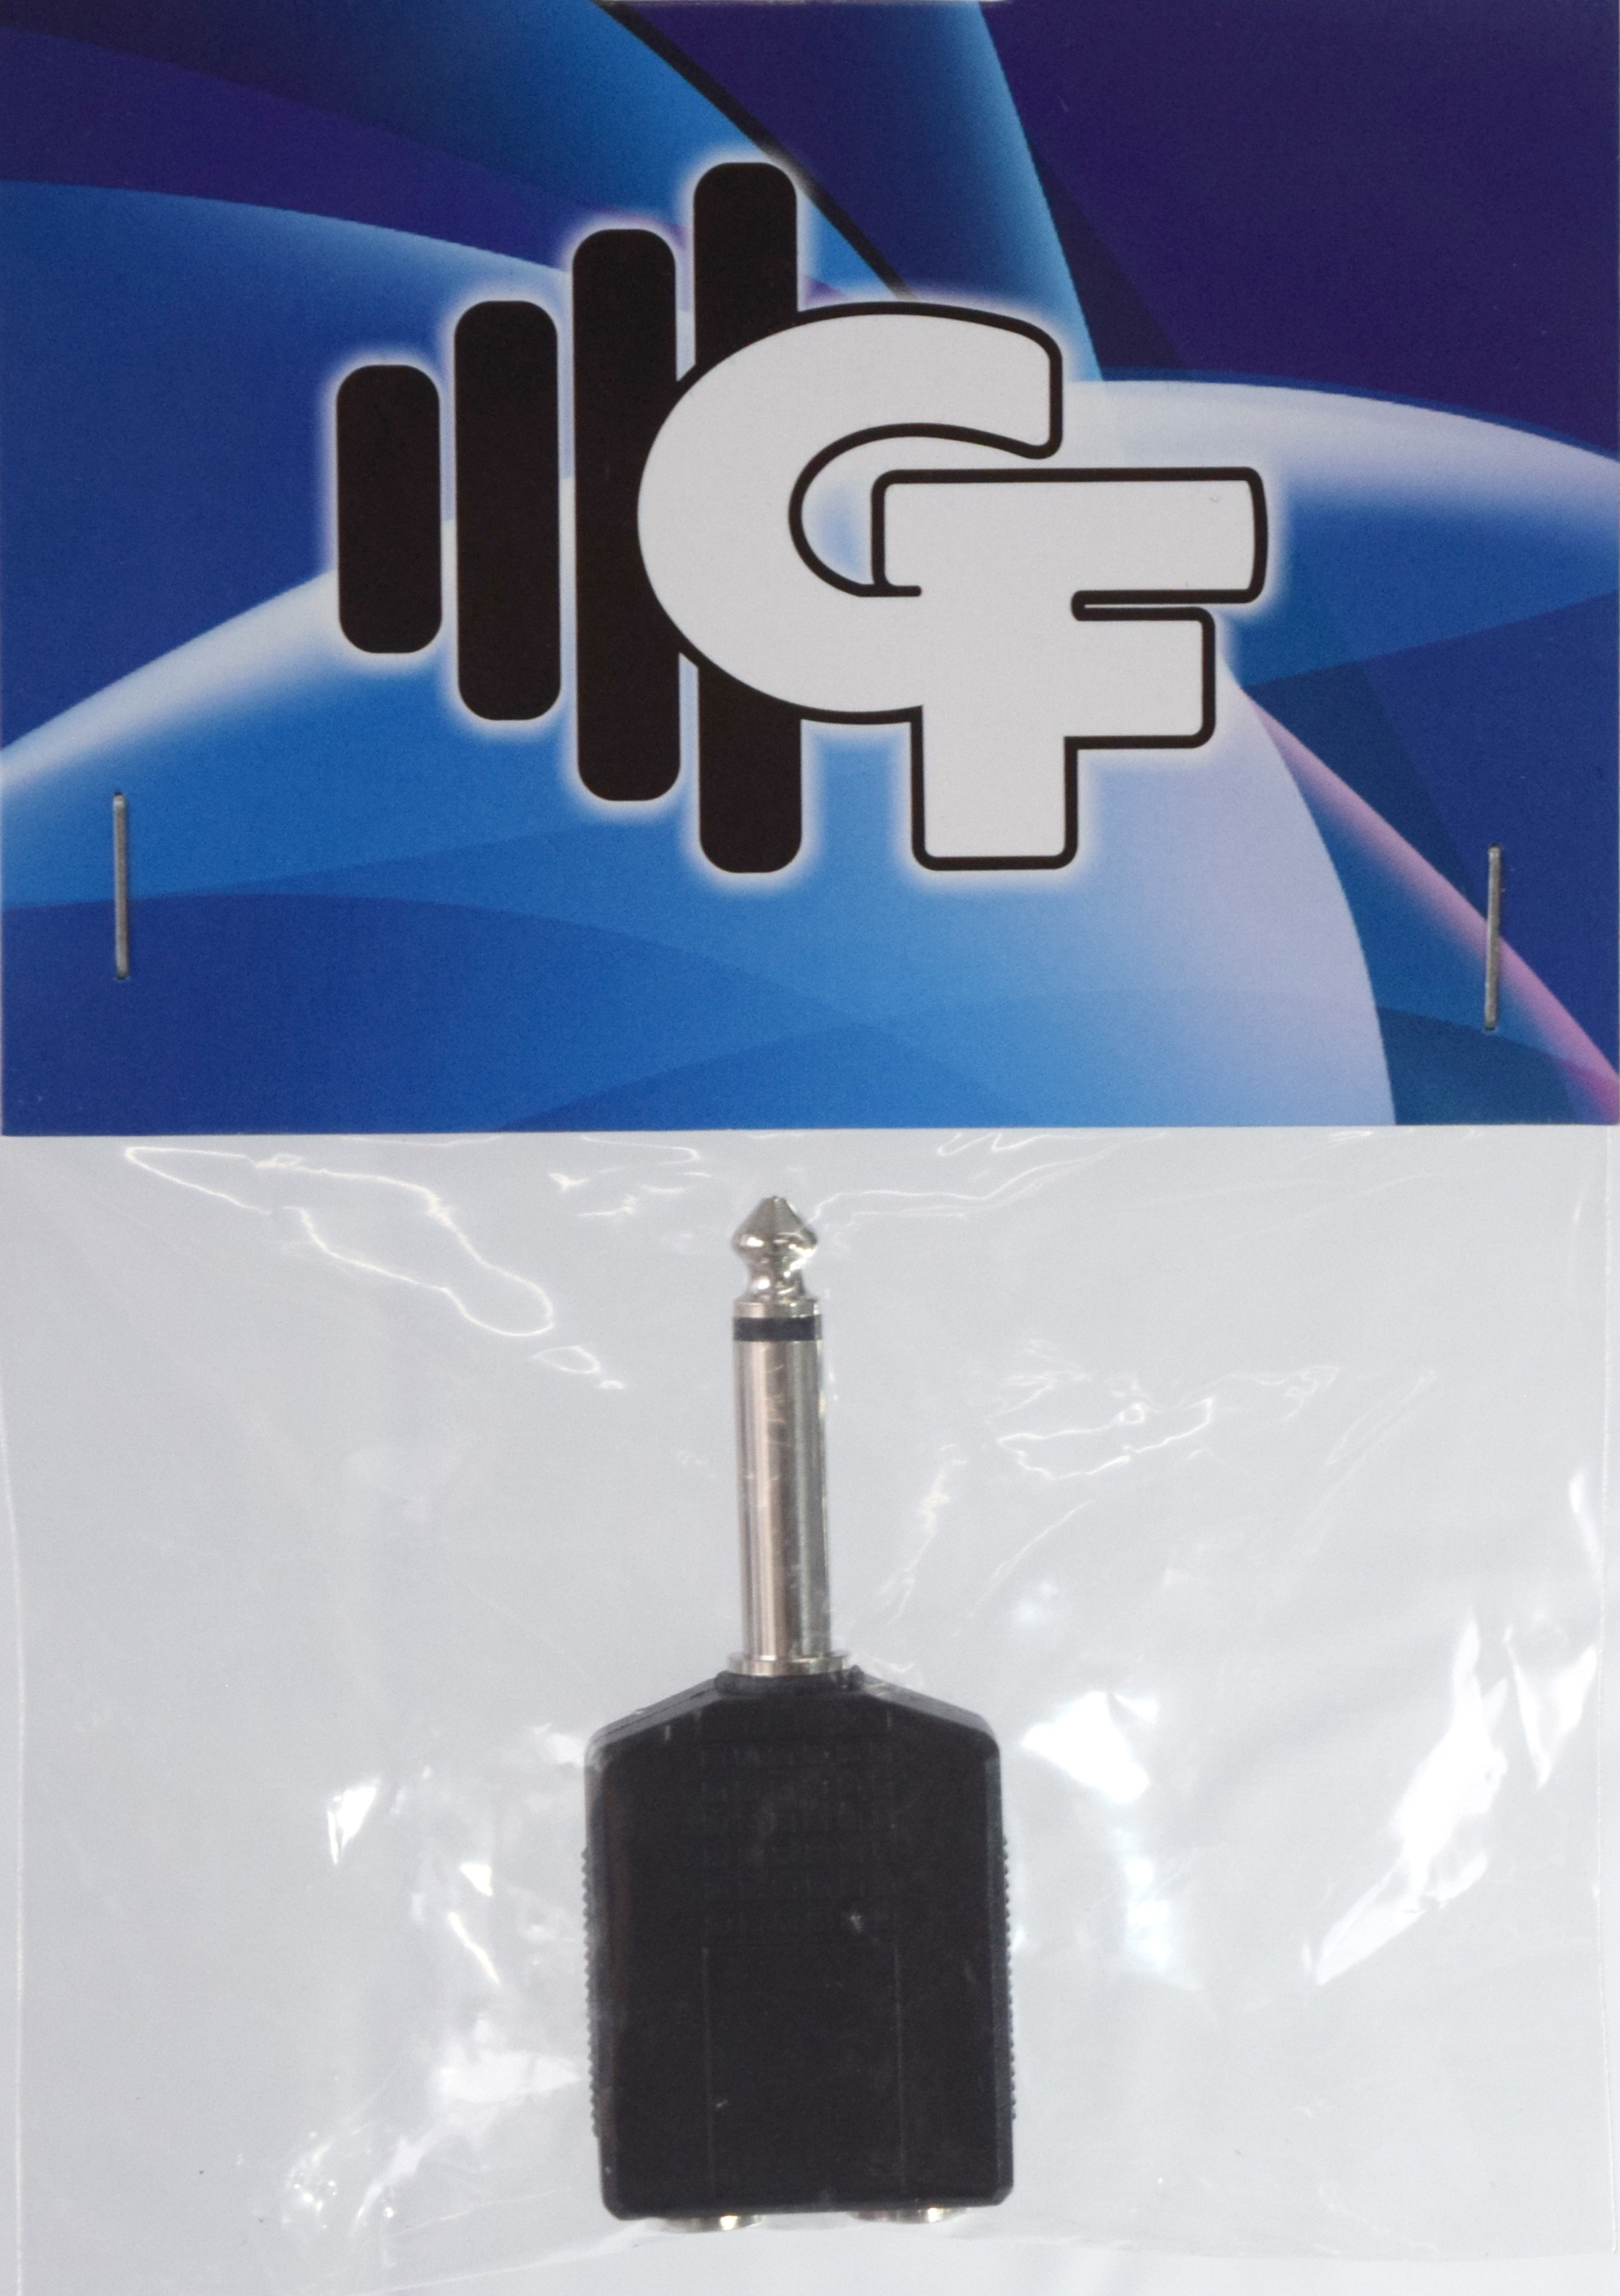 GRF COUPLER TRANSFORMER - 1/4 FEMALE (2X) X 1/4 MALE MONO